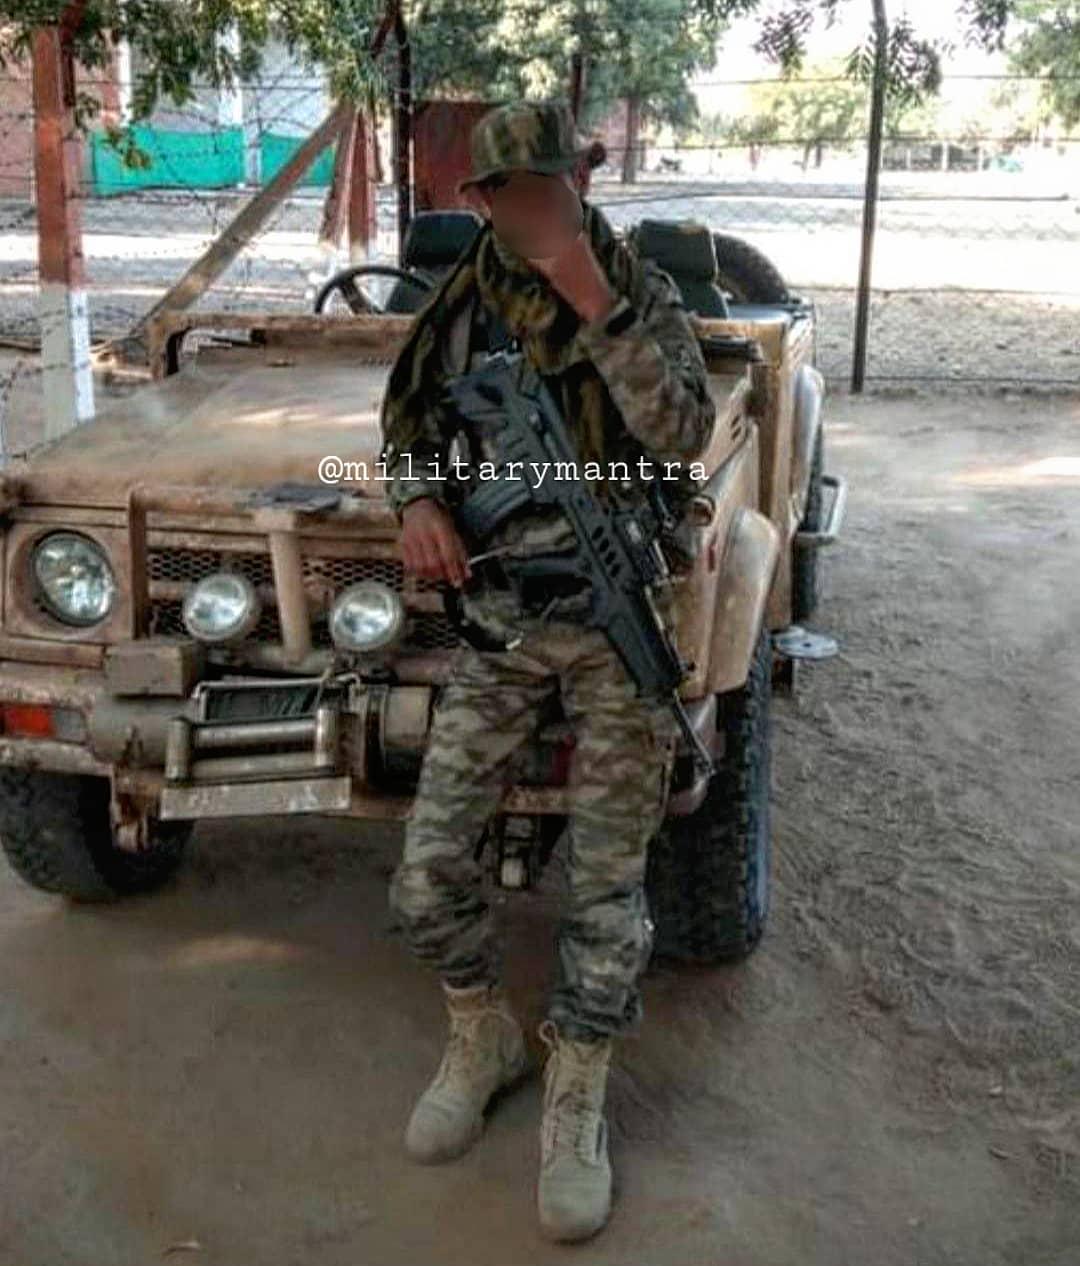 militarymantra_1611196221336465.jpg